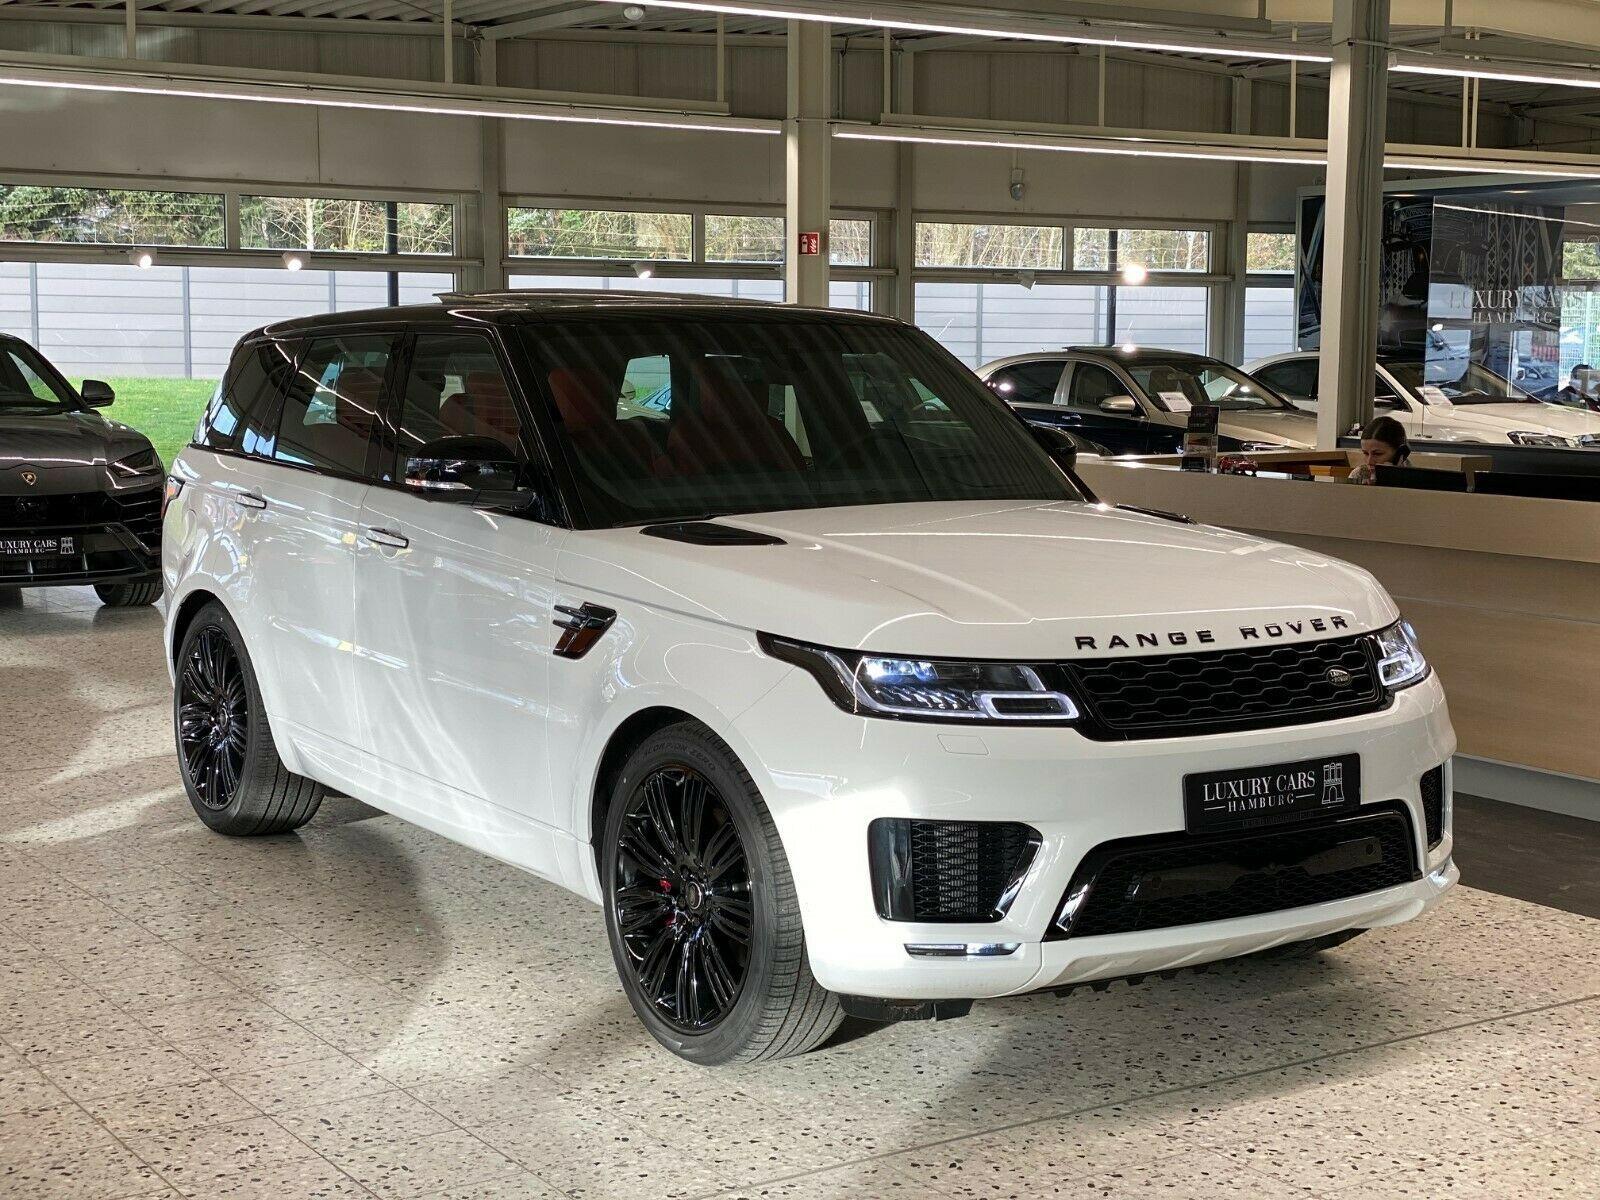 Land Rover Range Rover Sport Luxury Cars Hamburg